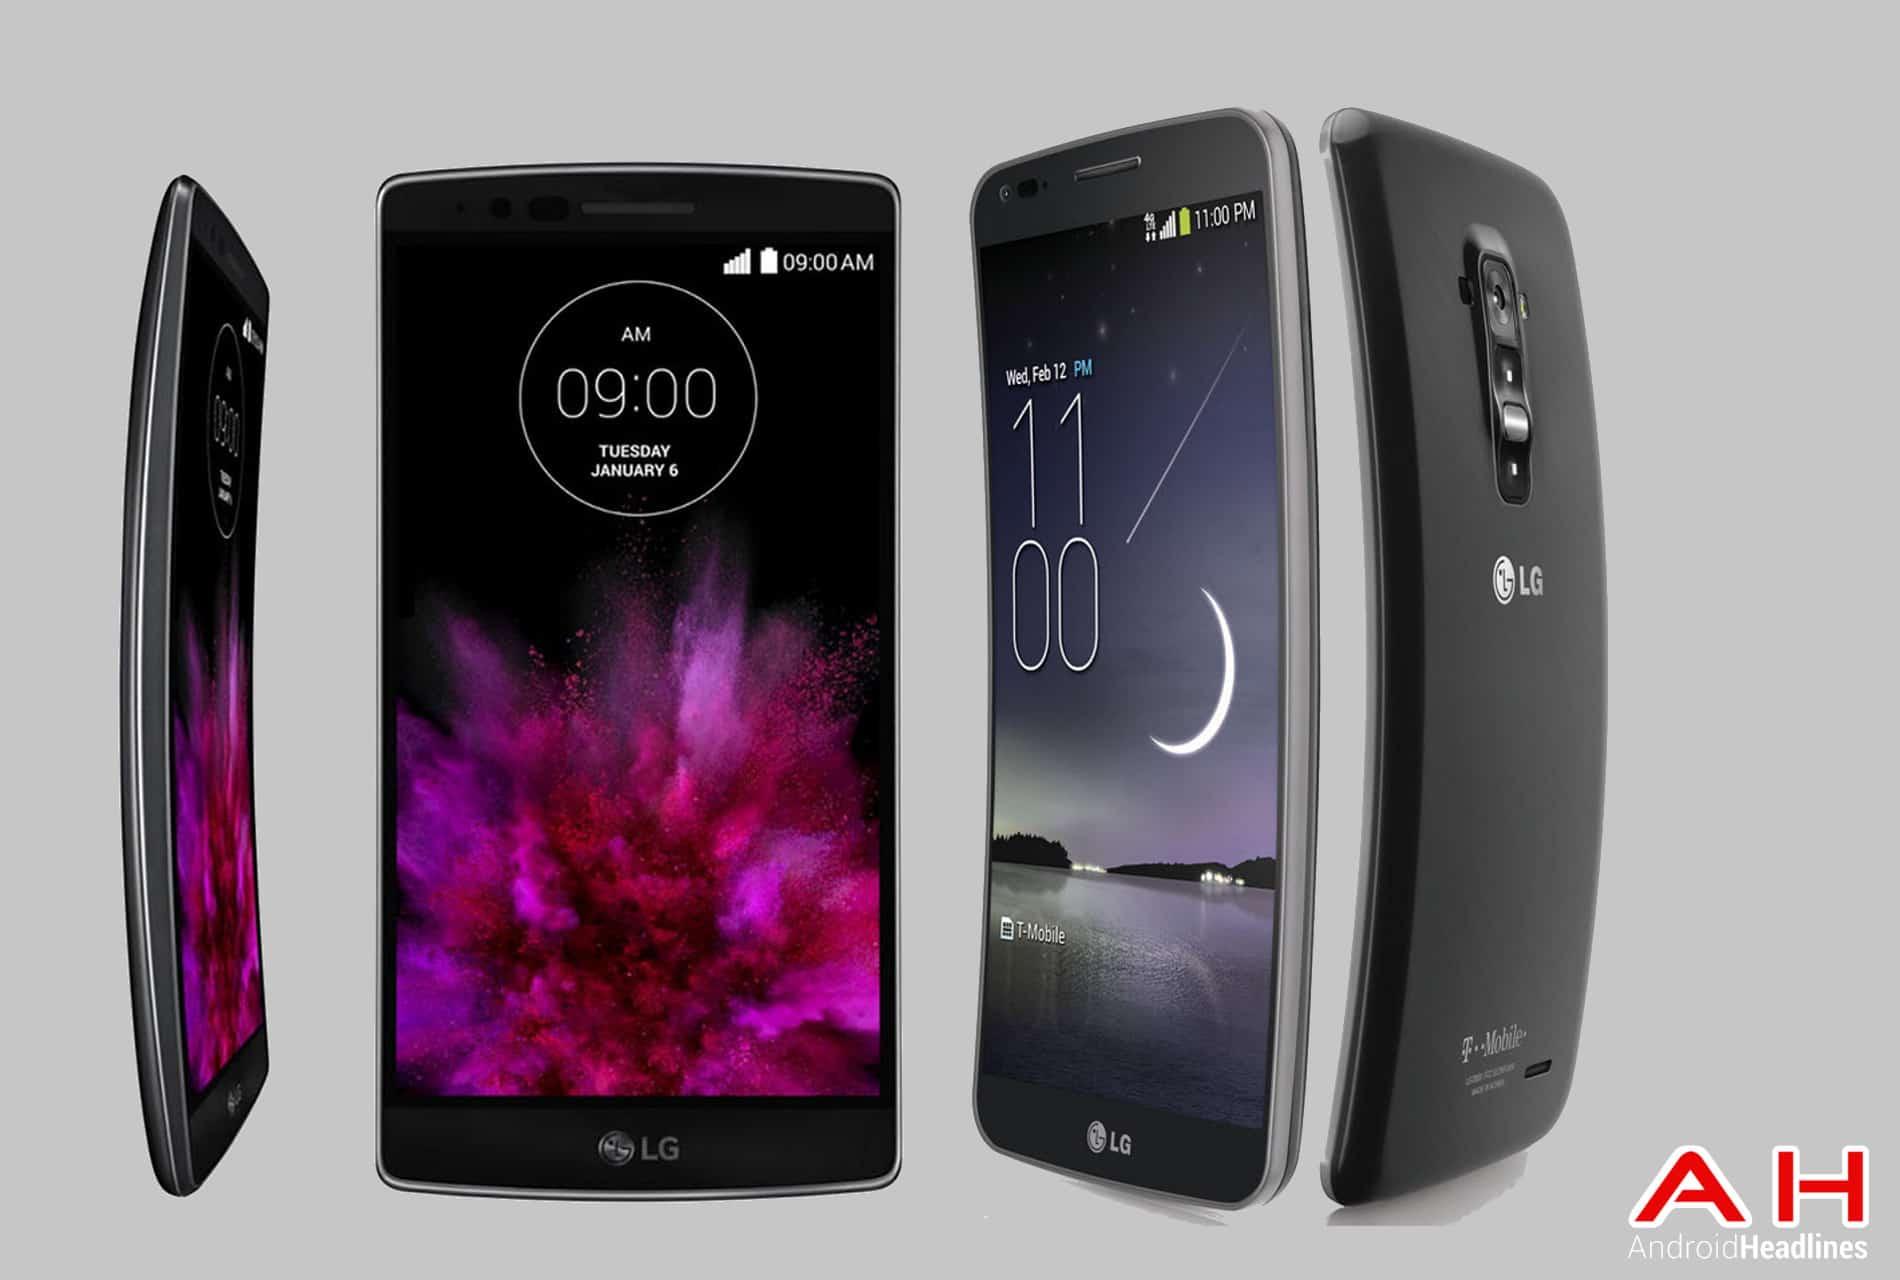 LG G Flex 2 vs G Flex cam2 AH